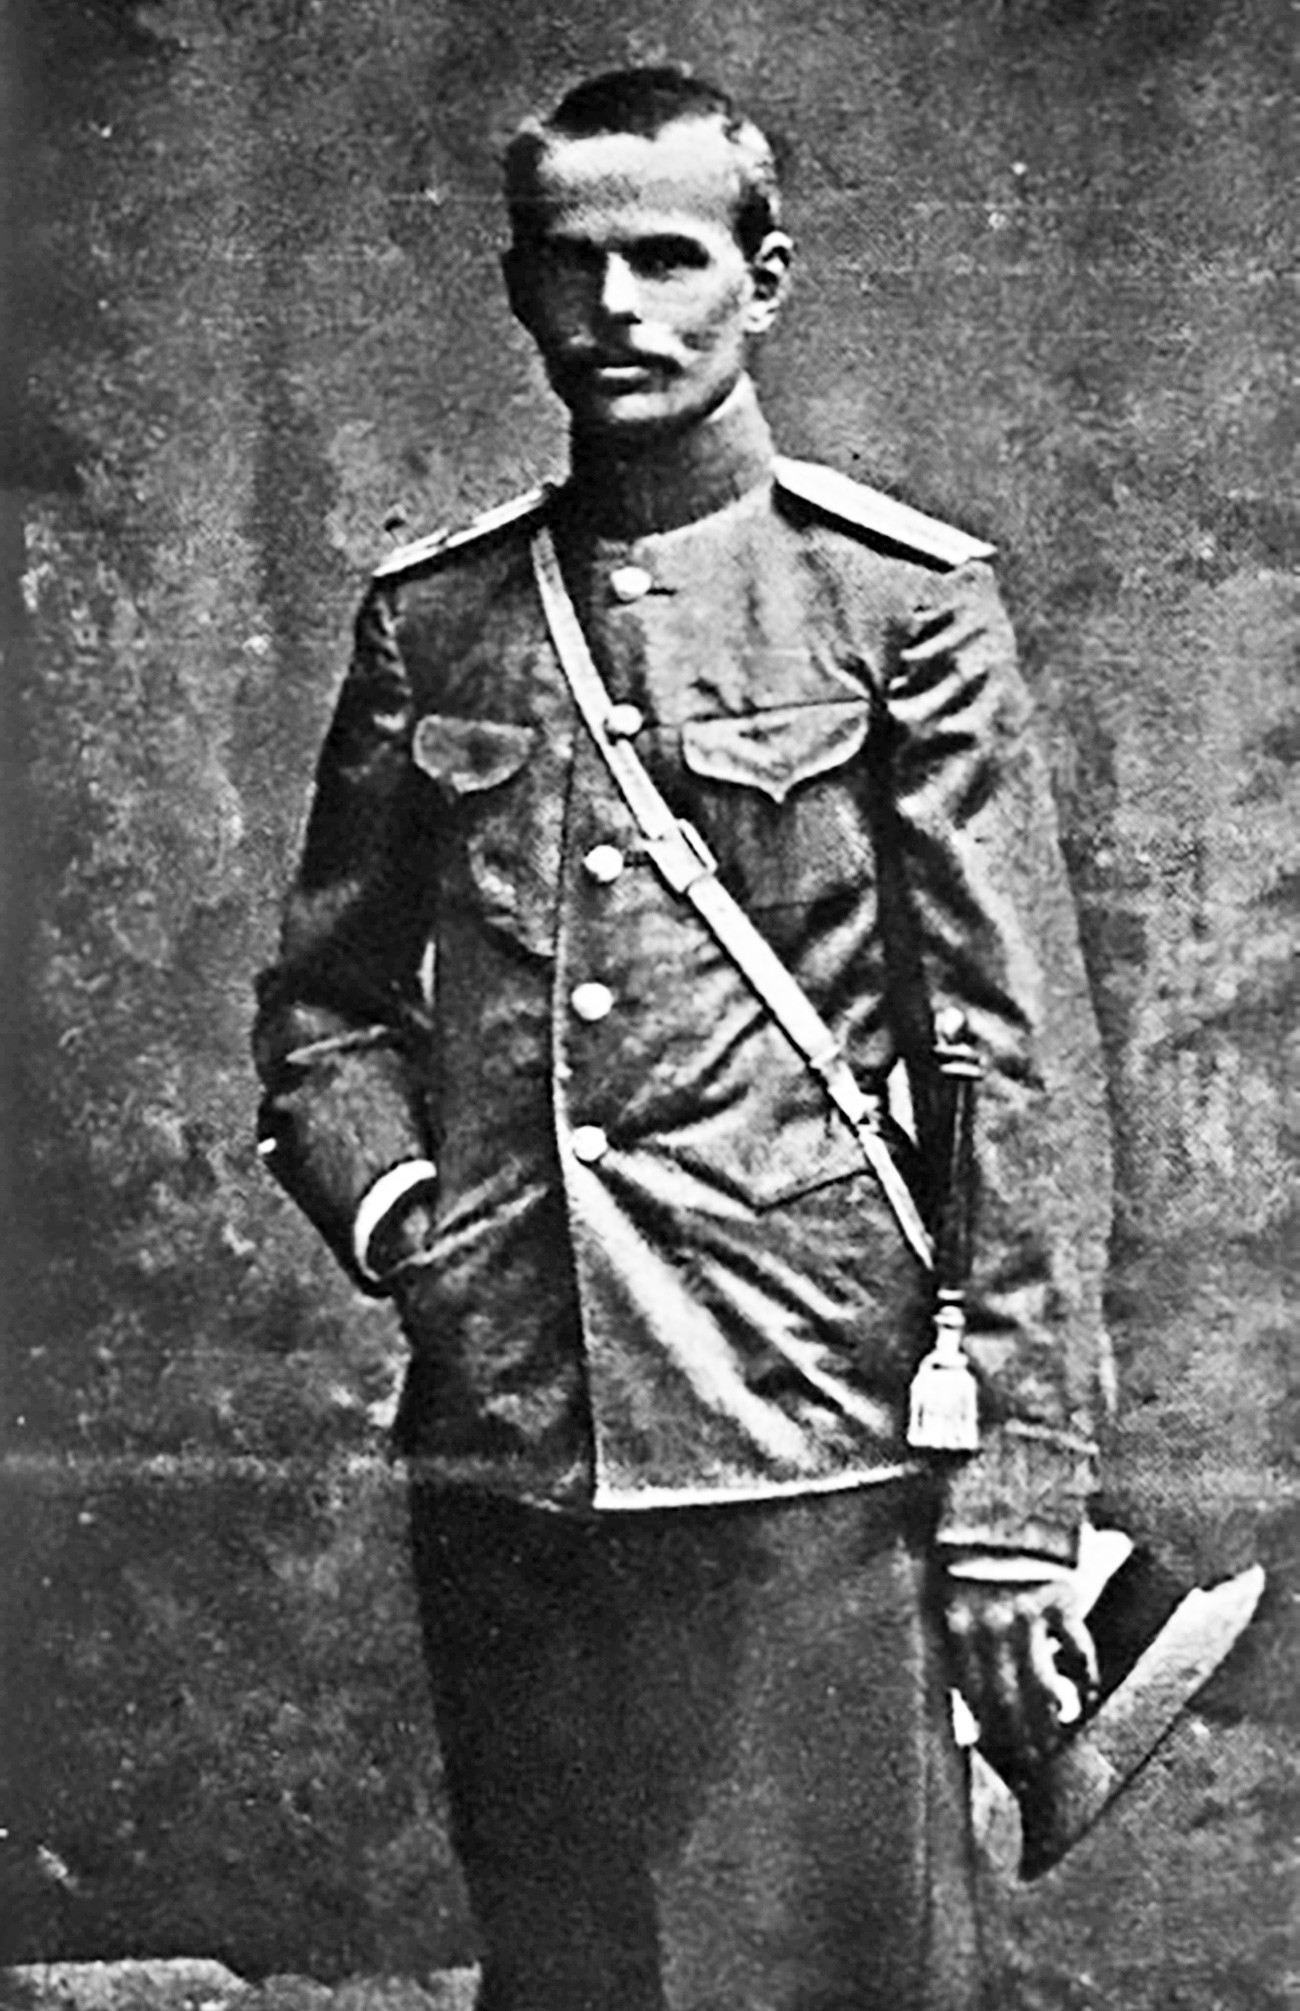 Roman von Ungern selama tugas militer pada Perang Dunia I.